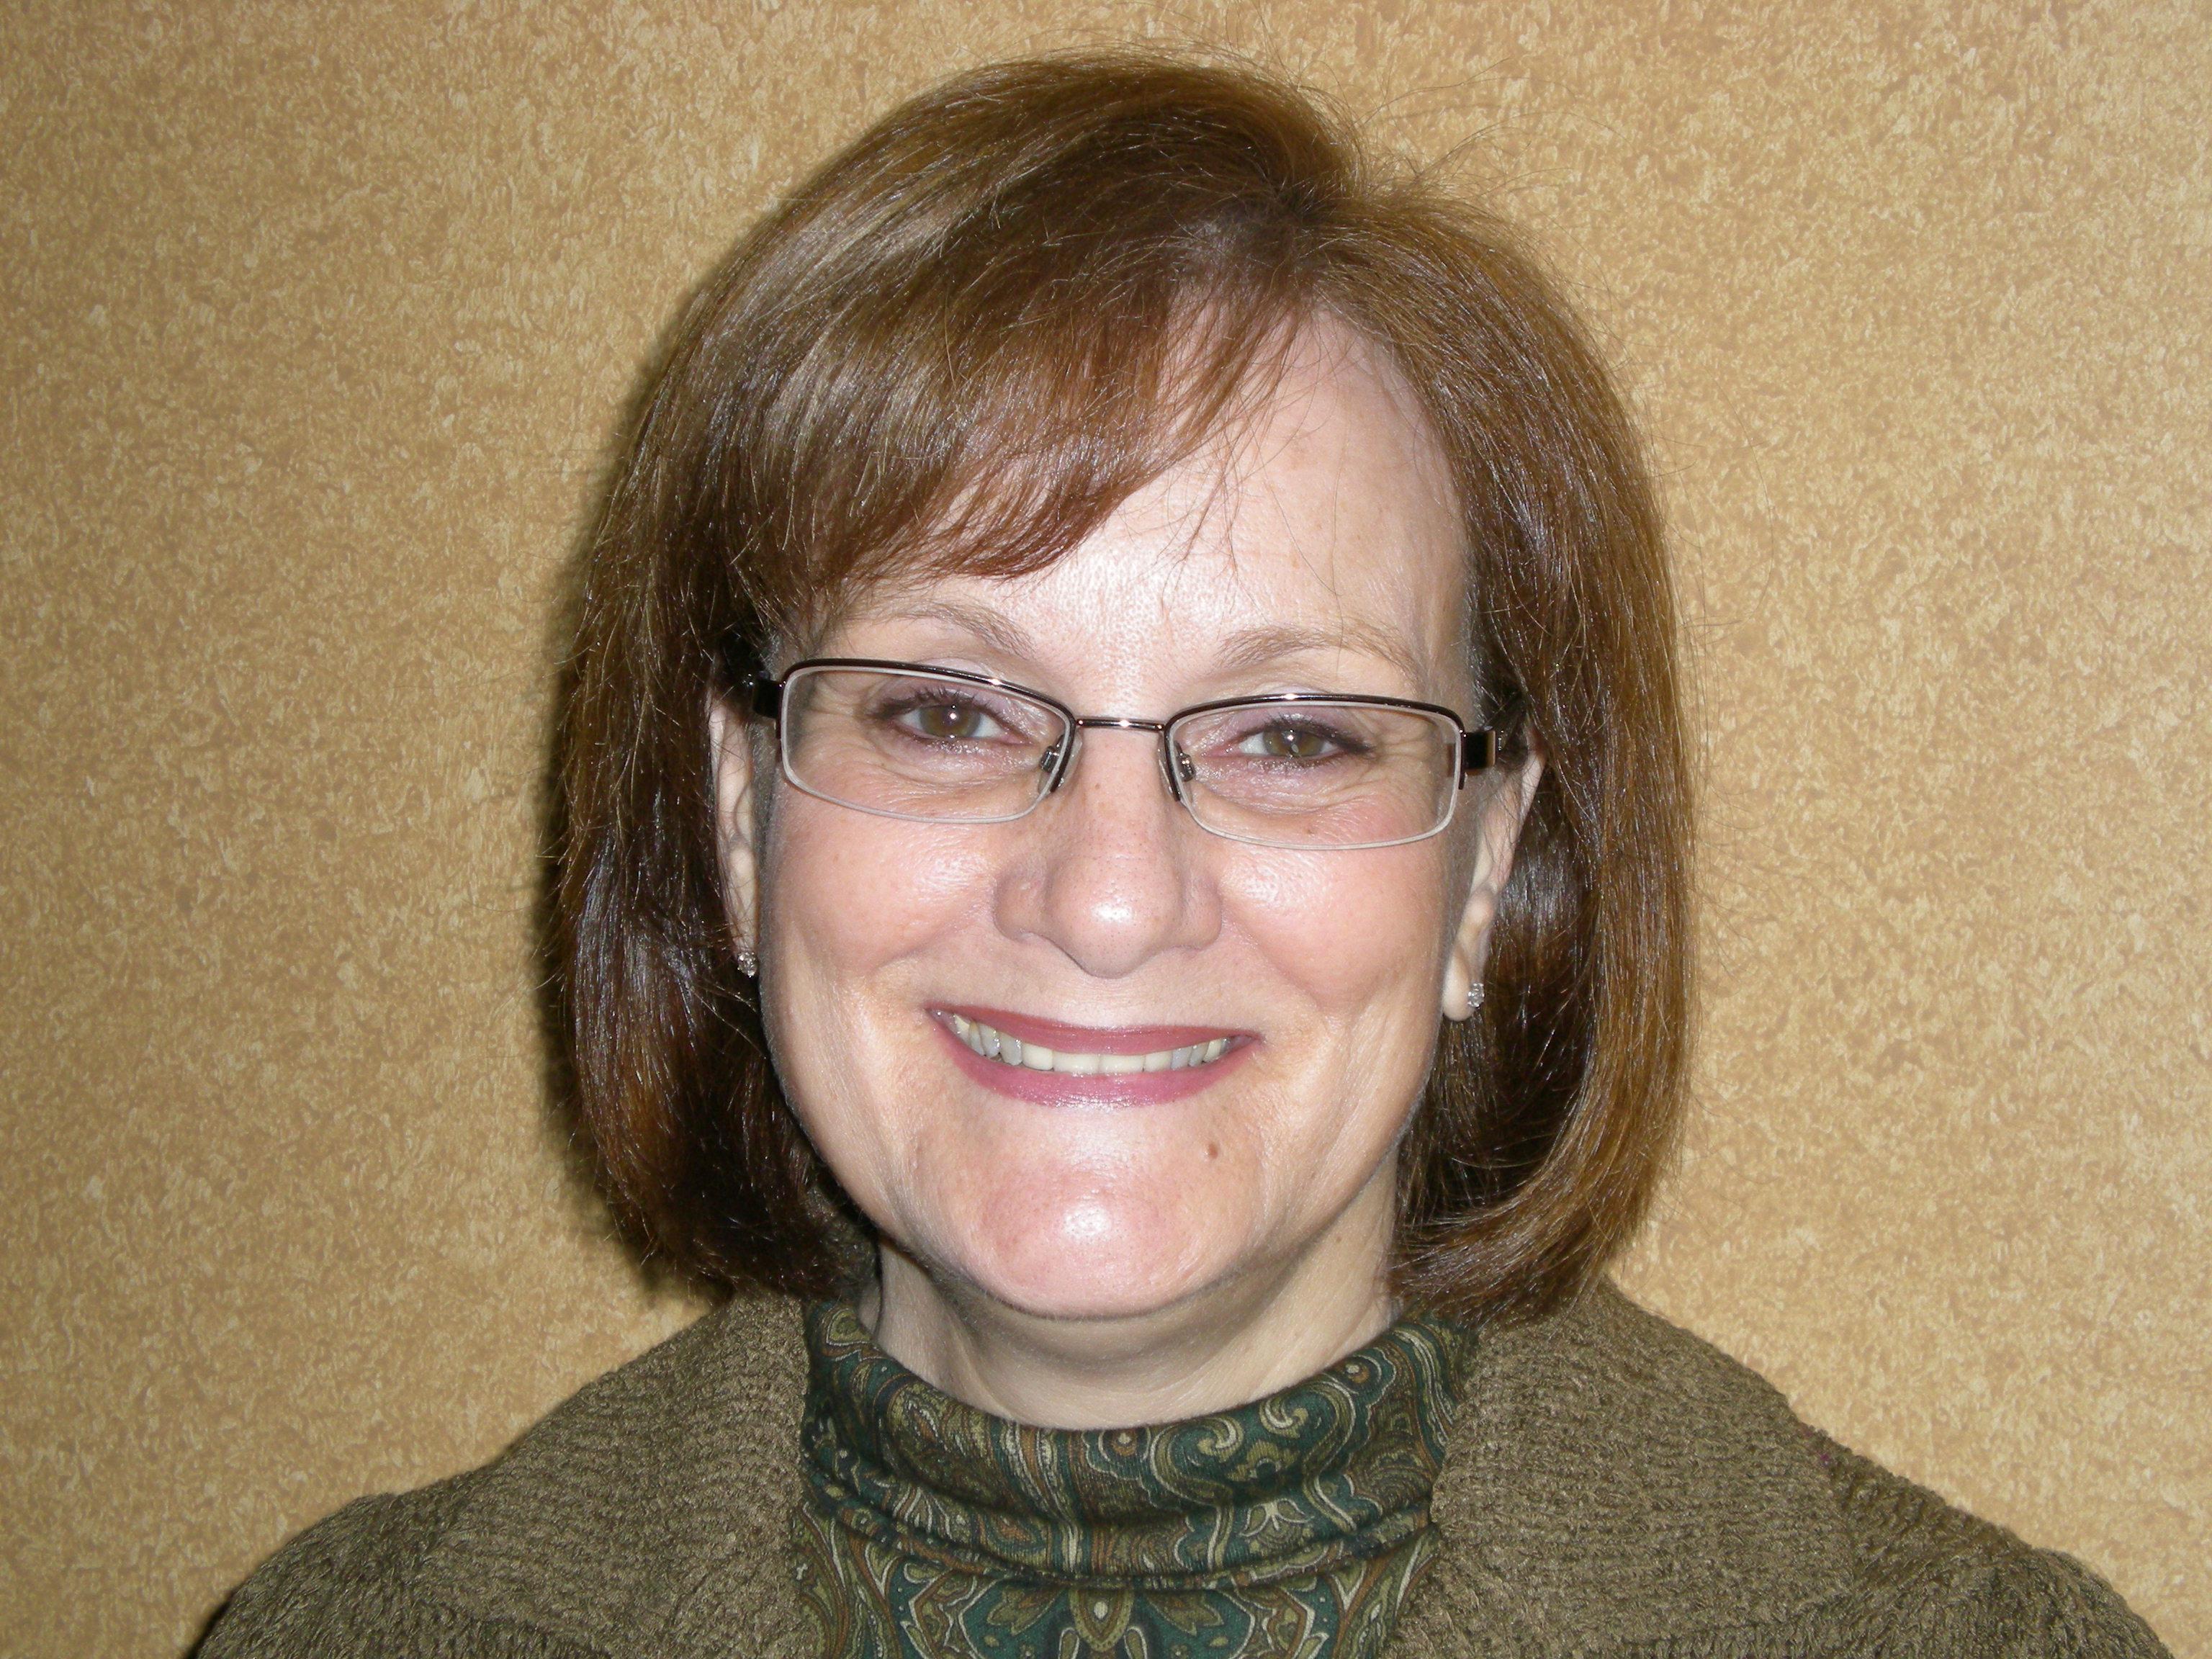 Sharon Tufo